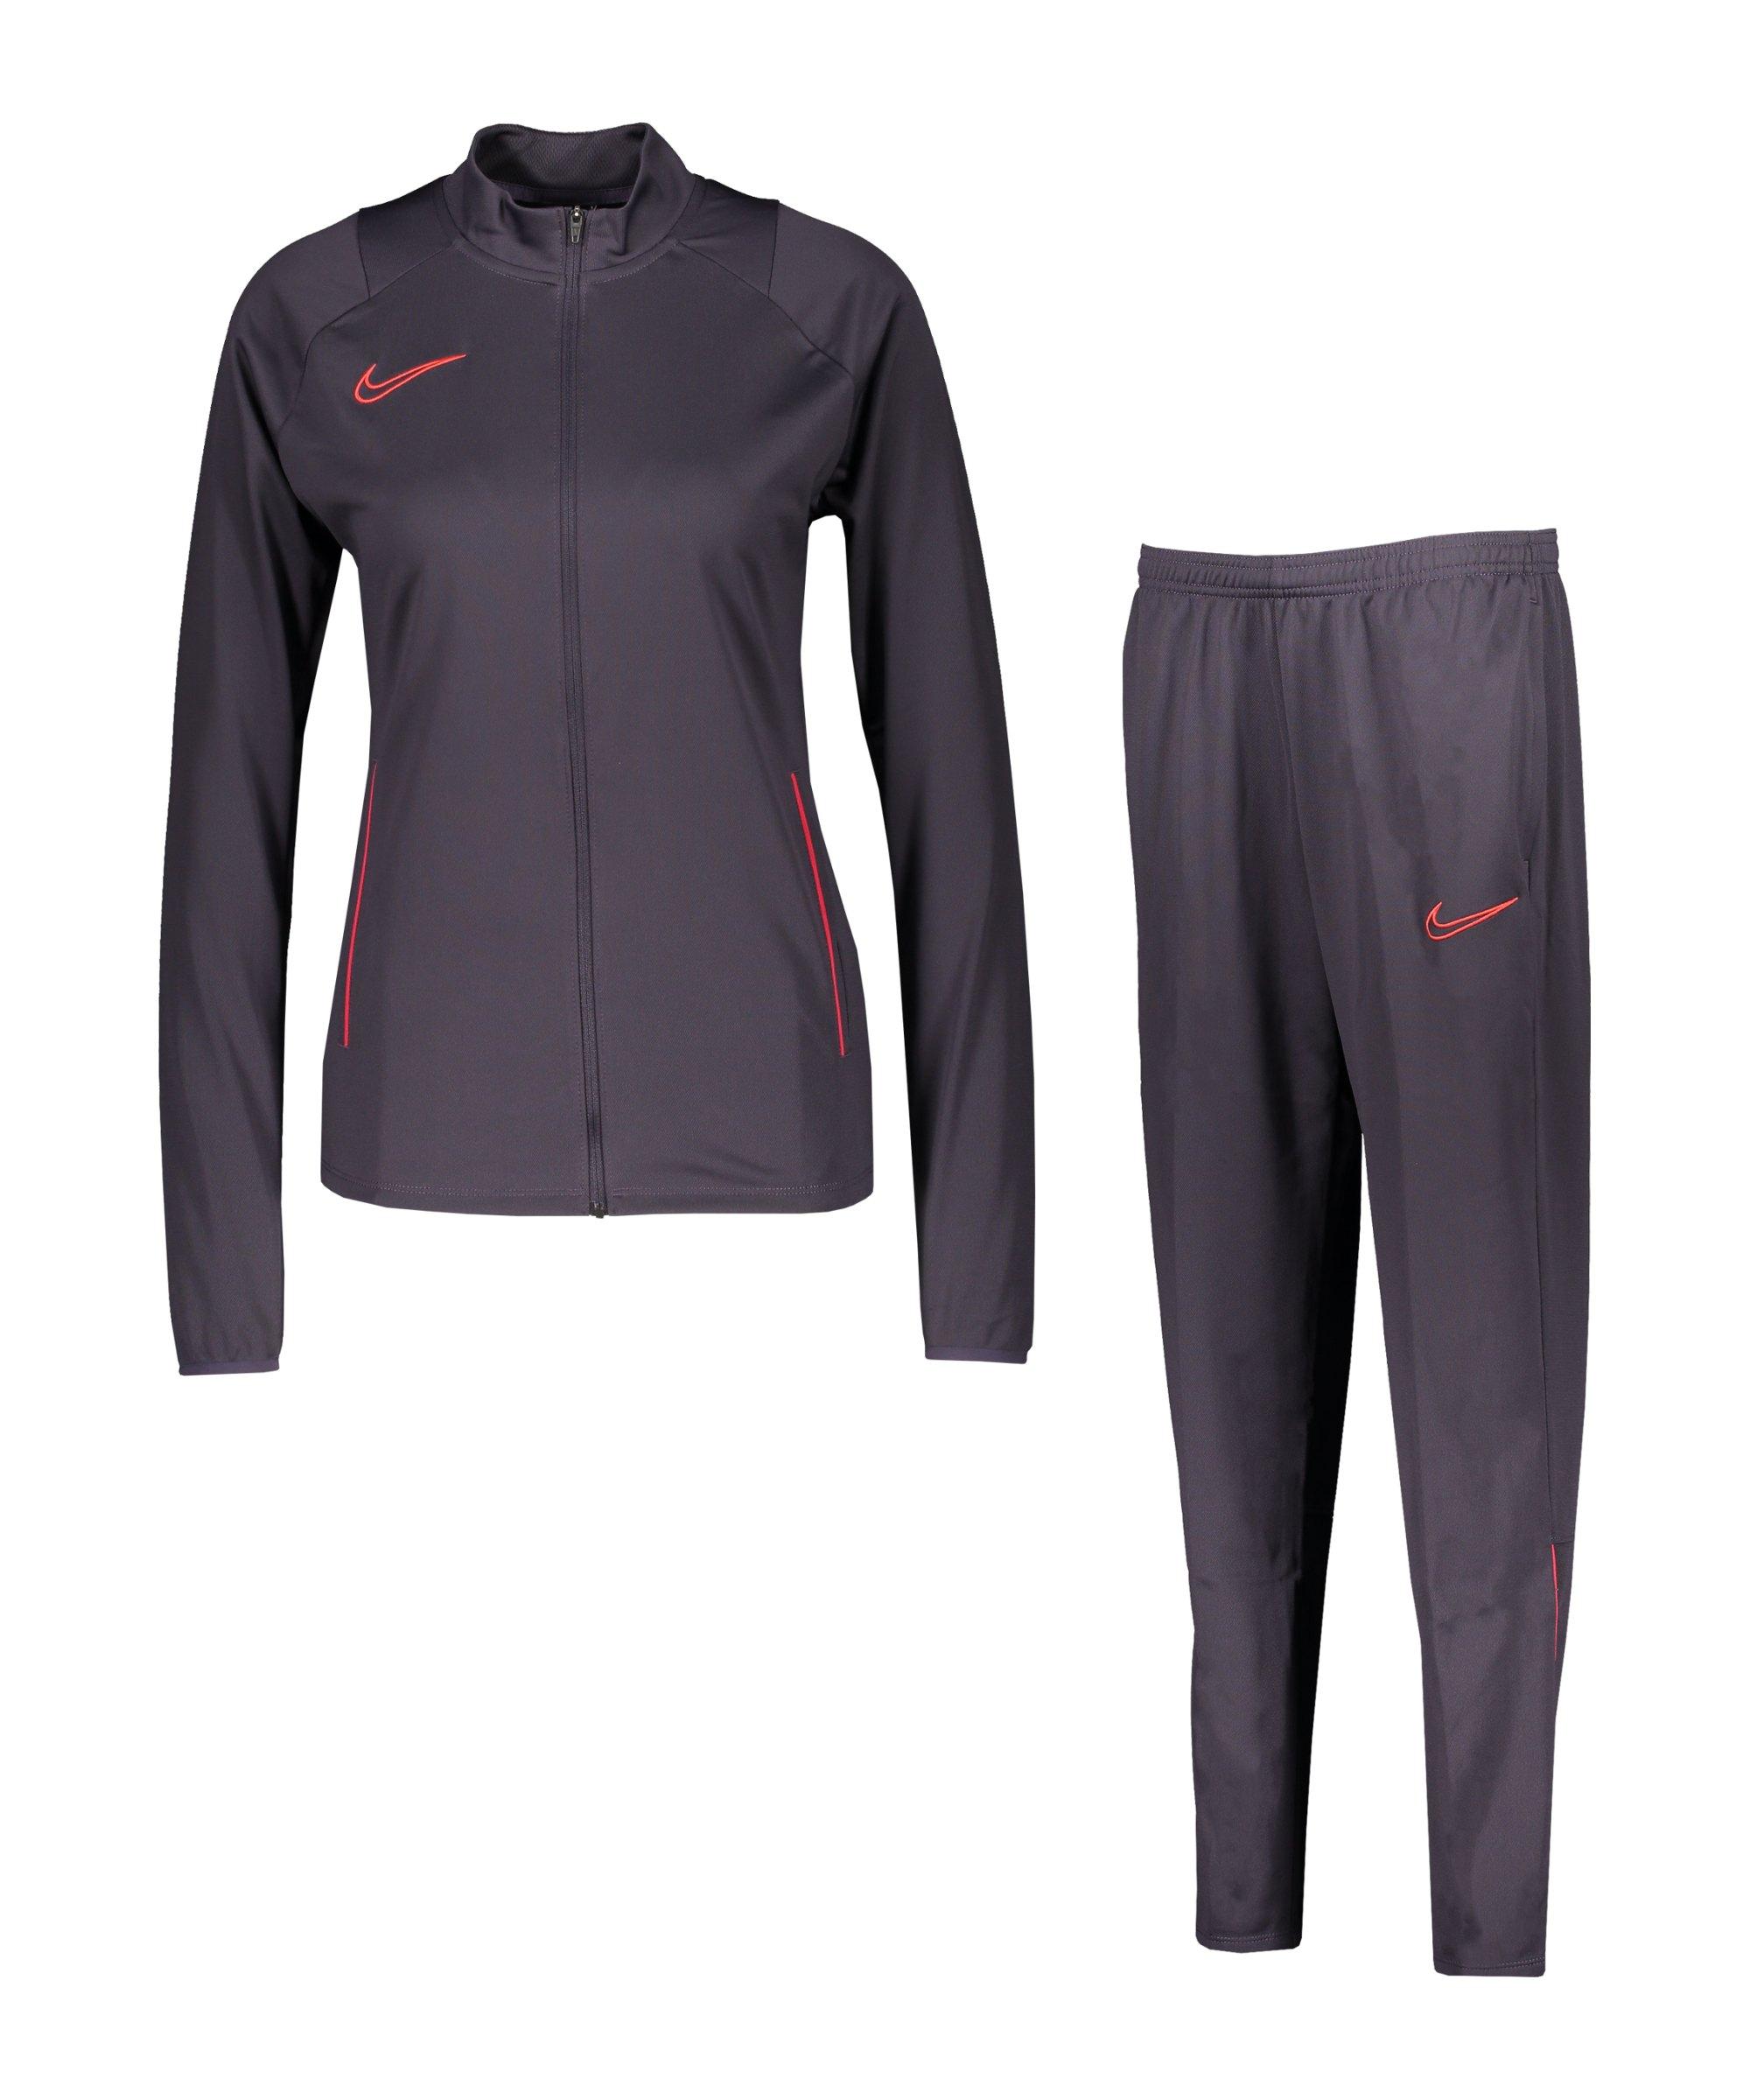 Nike Academy 21 Trainingsanzug Damen F573 - lila